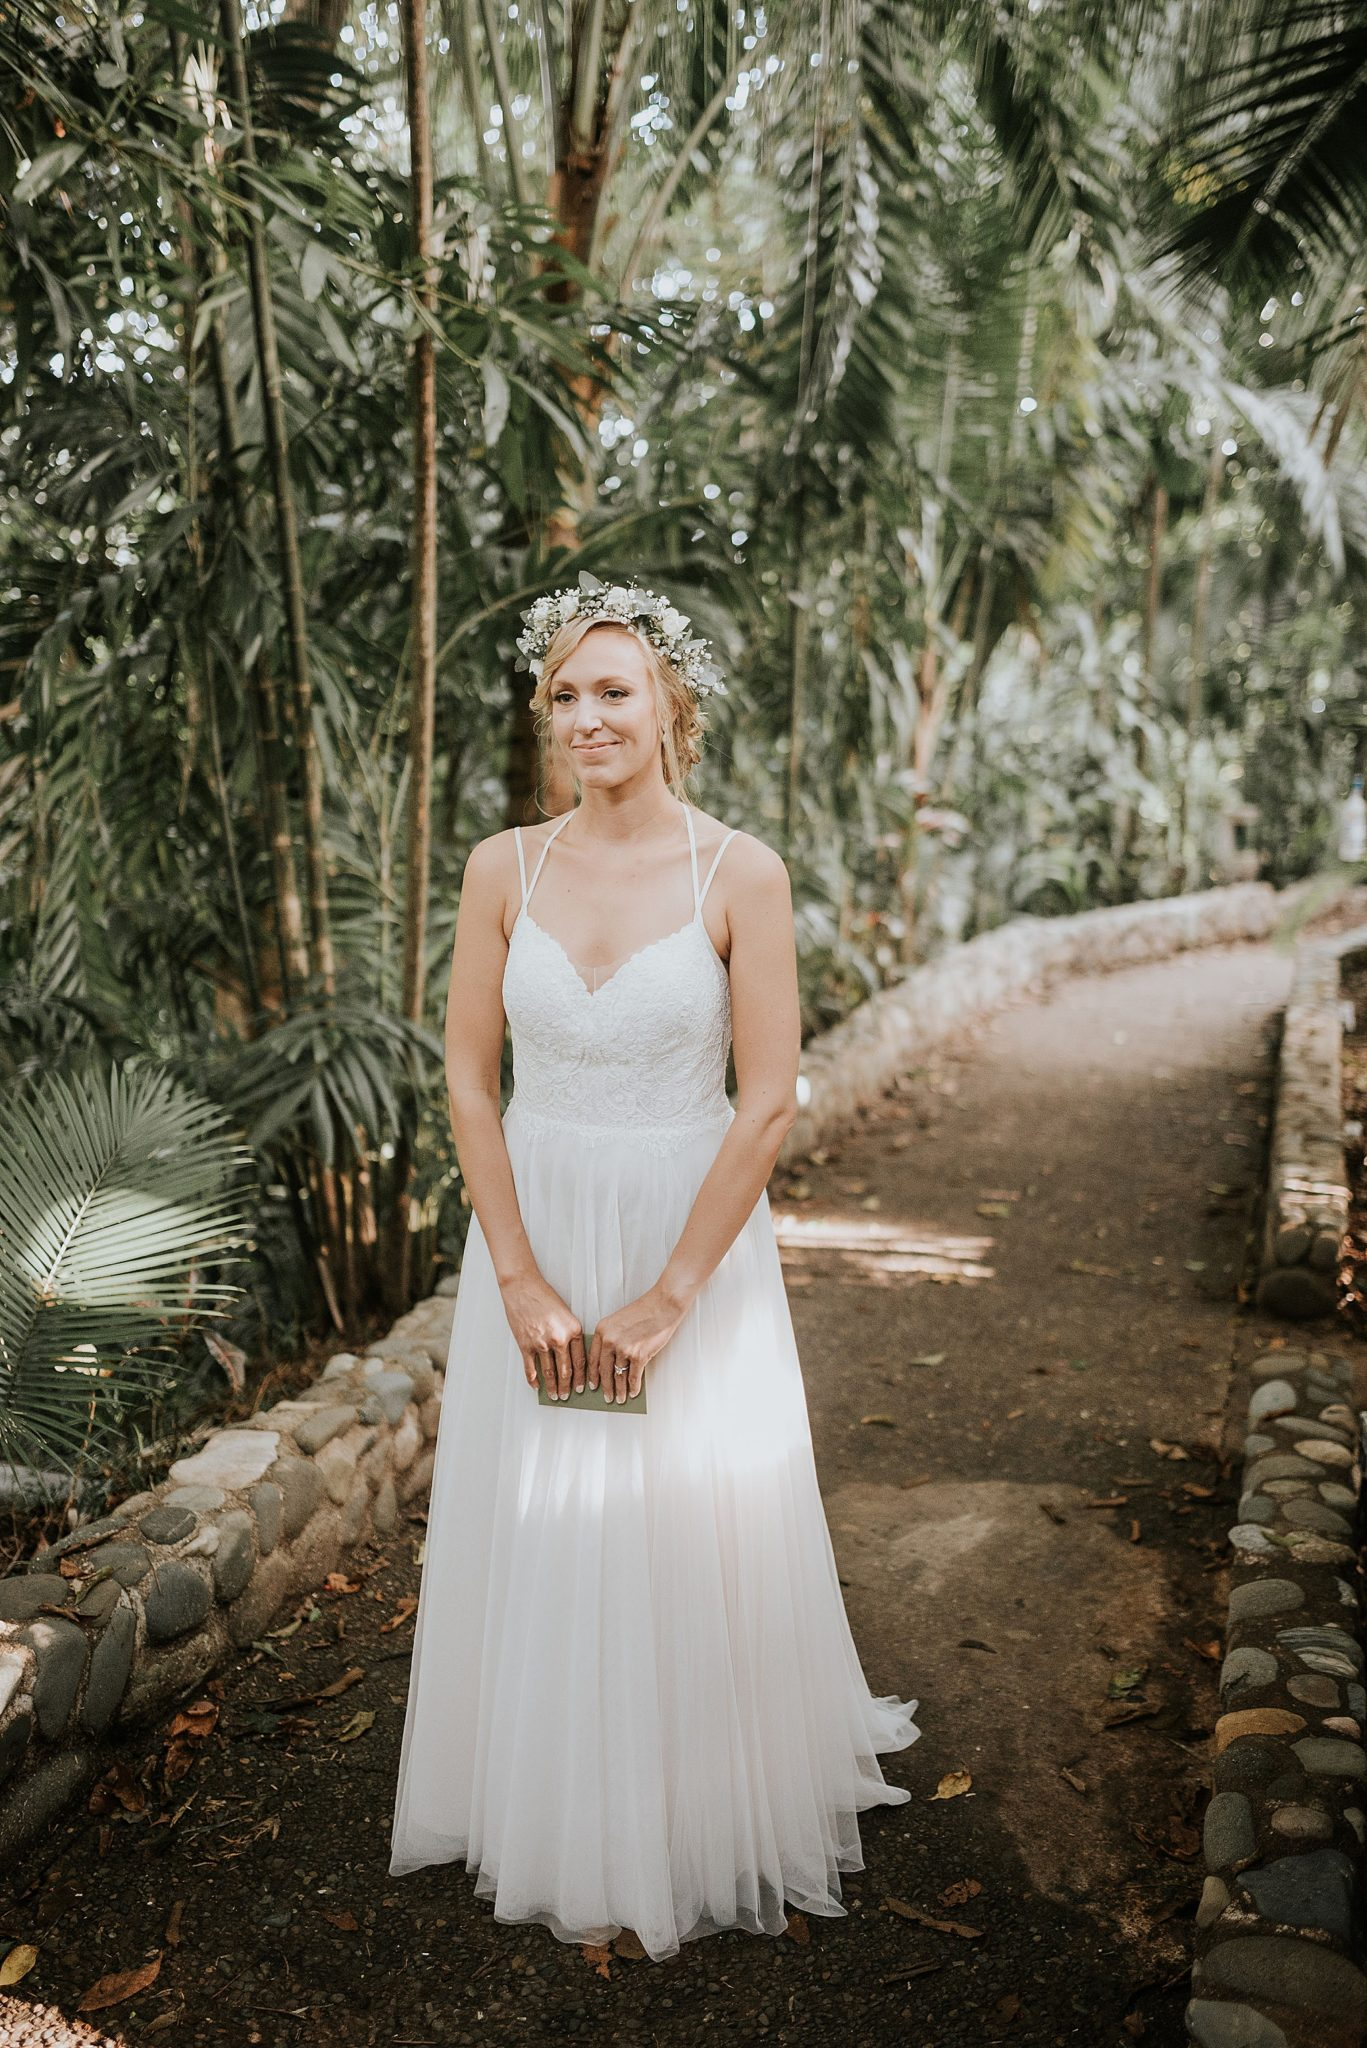 21Kelsey_jacob_beach_wedding_costa_rica_photography_0021.jpg